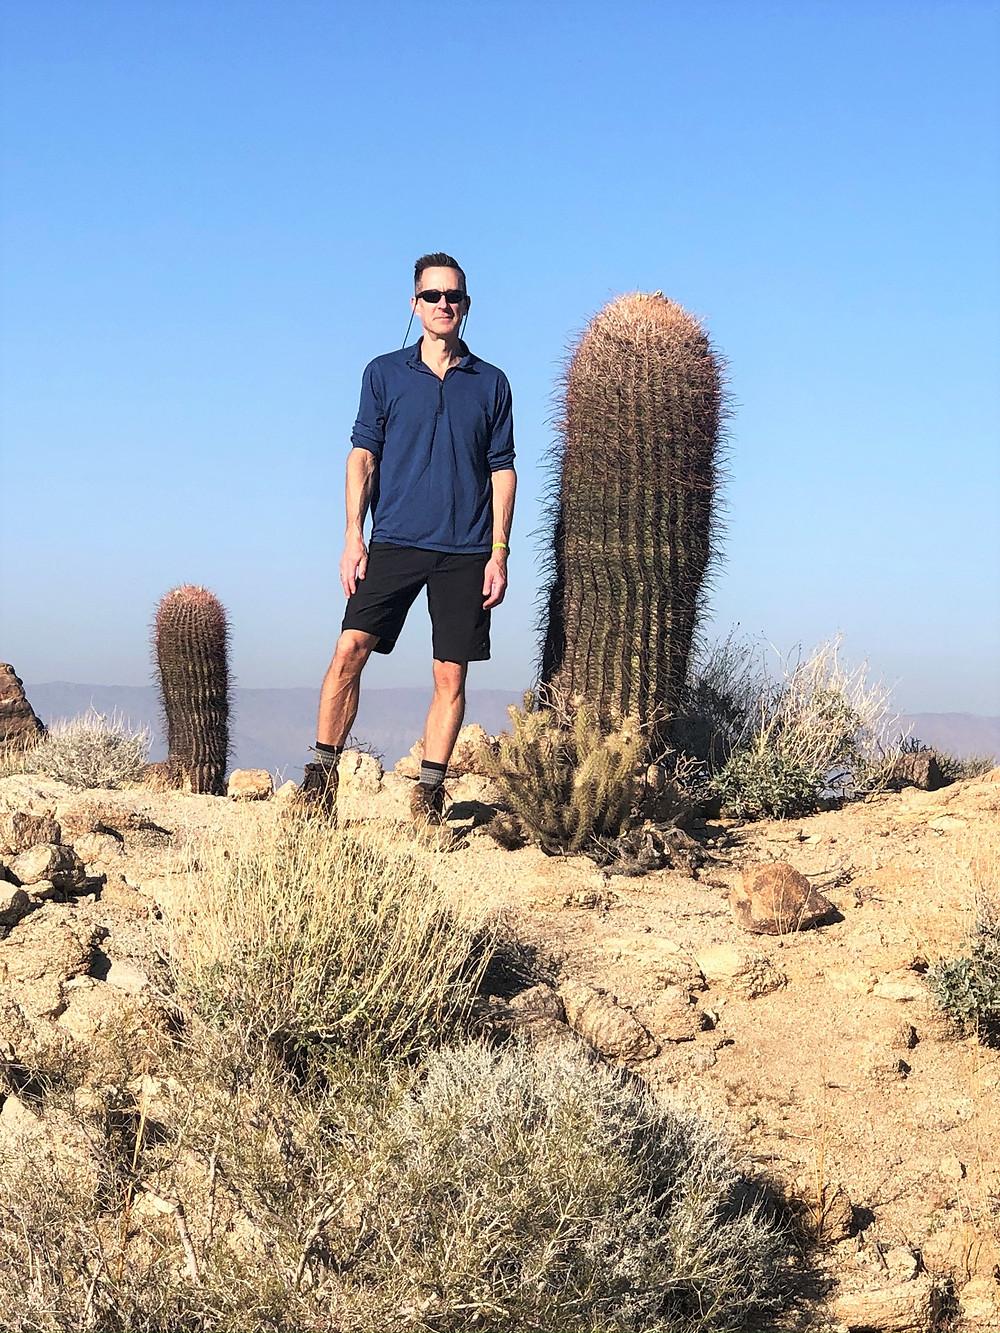 California barrel cactus along the Art Smith Trail in the Santa Rosa Mountains